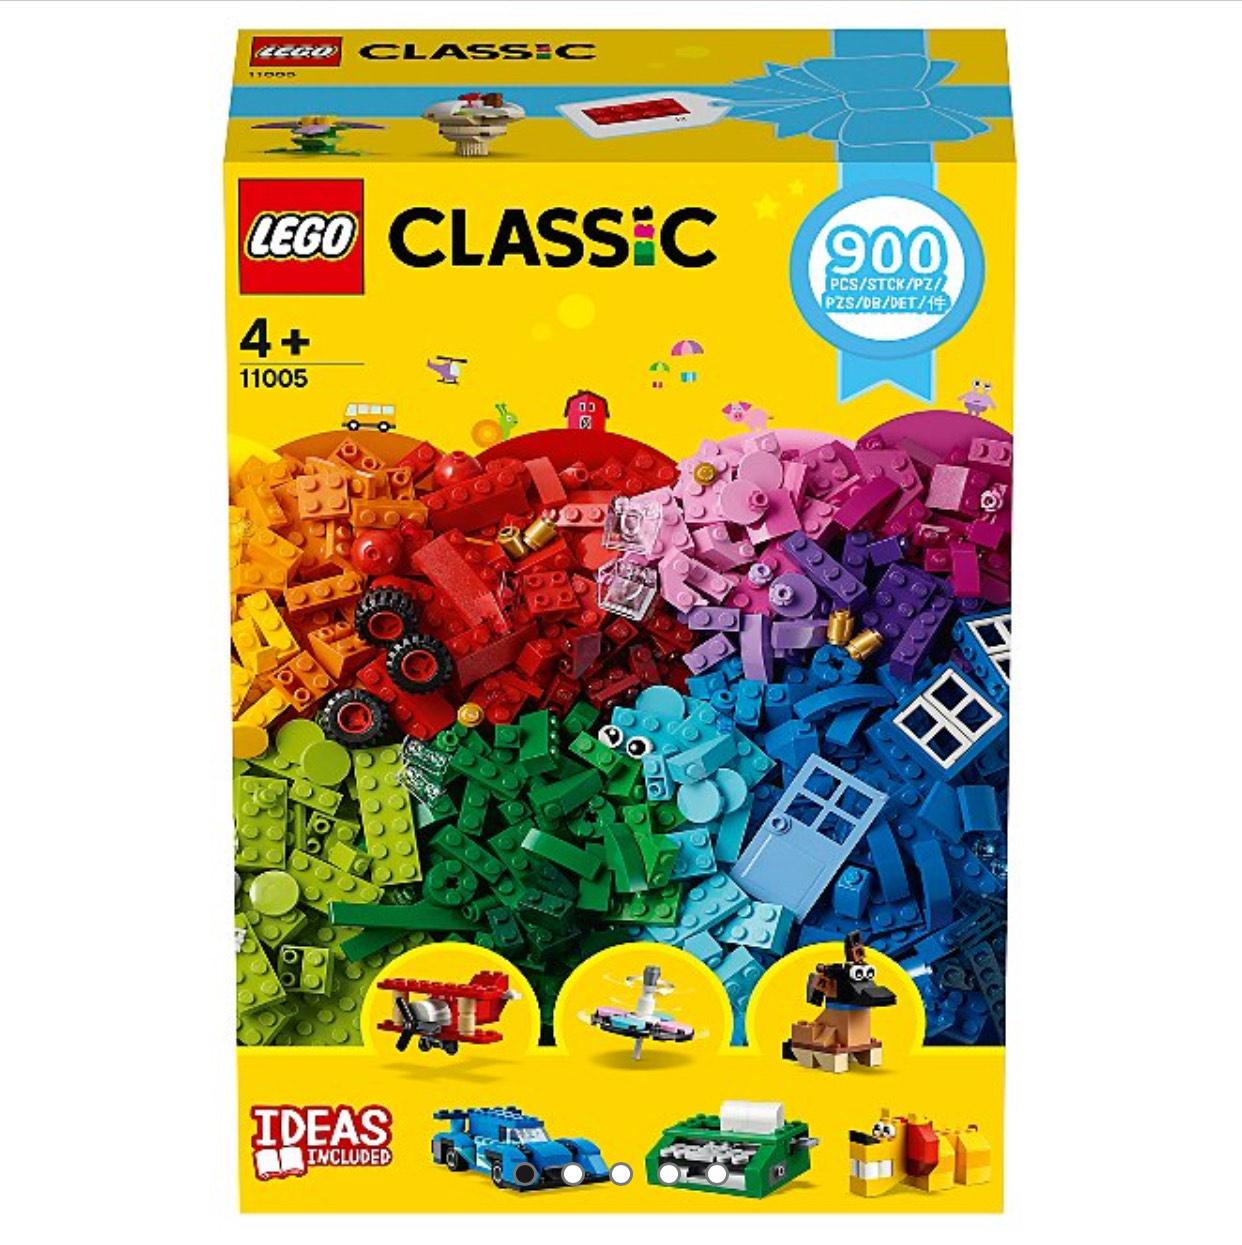 LEGO Classic Creative Fun - 11005 Free click and collect £18 @ George Asda